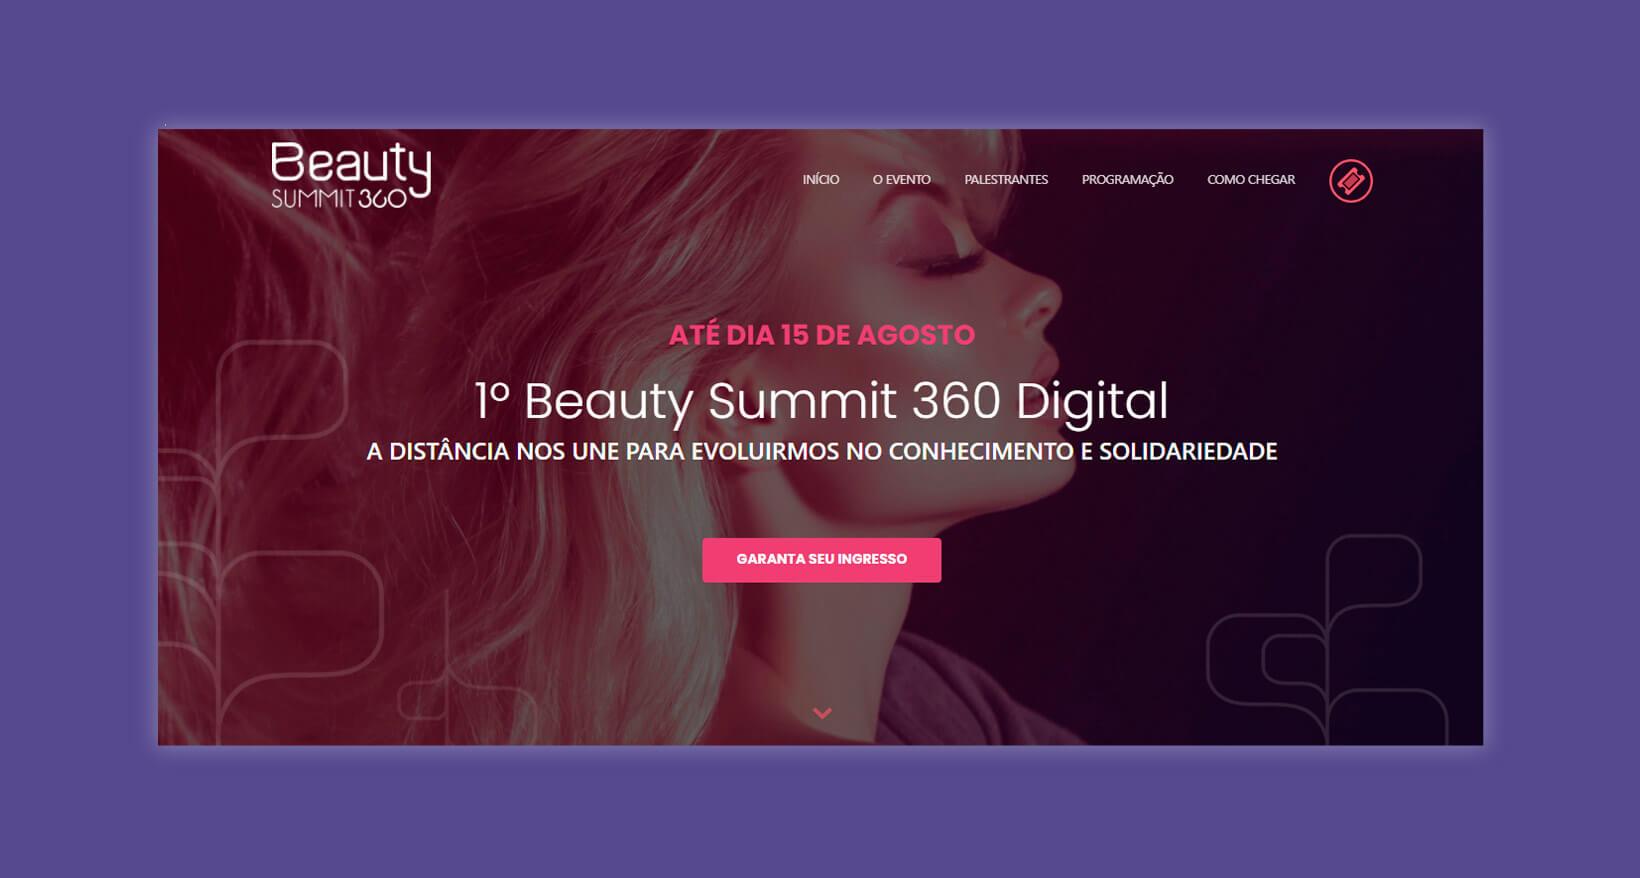 Beauty Summit 360 Digital